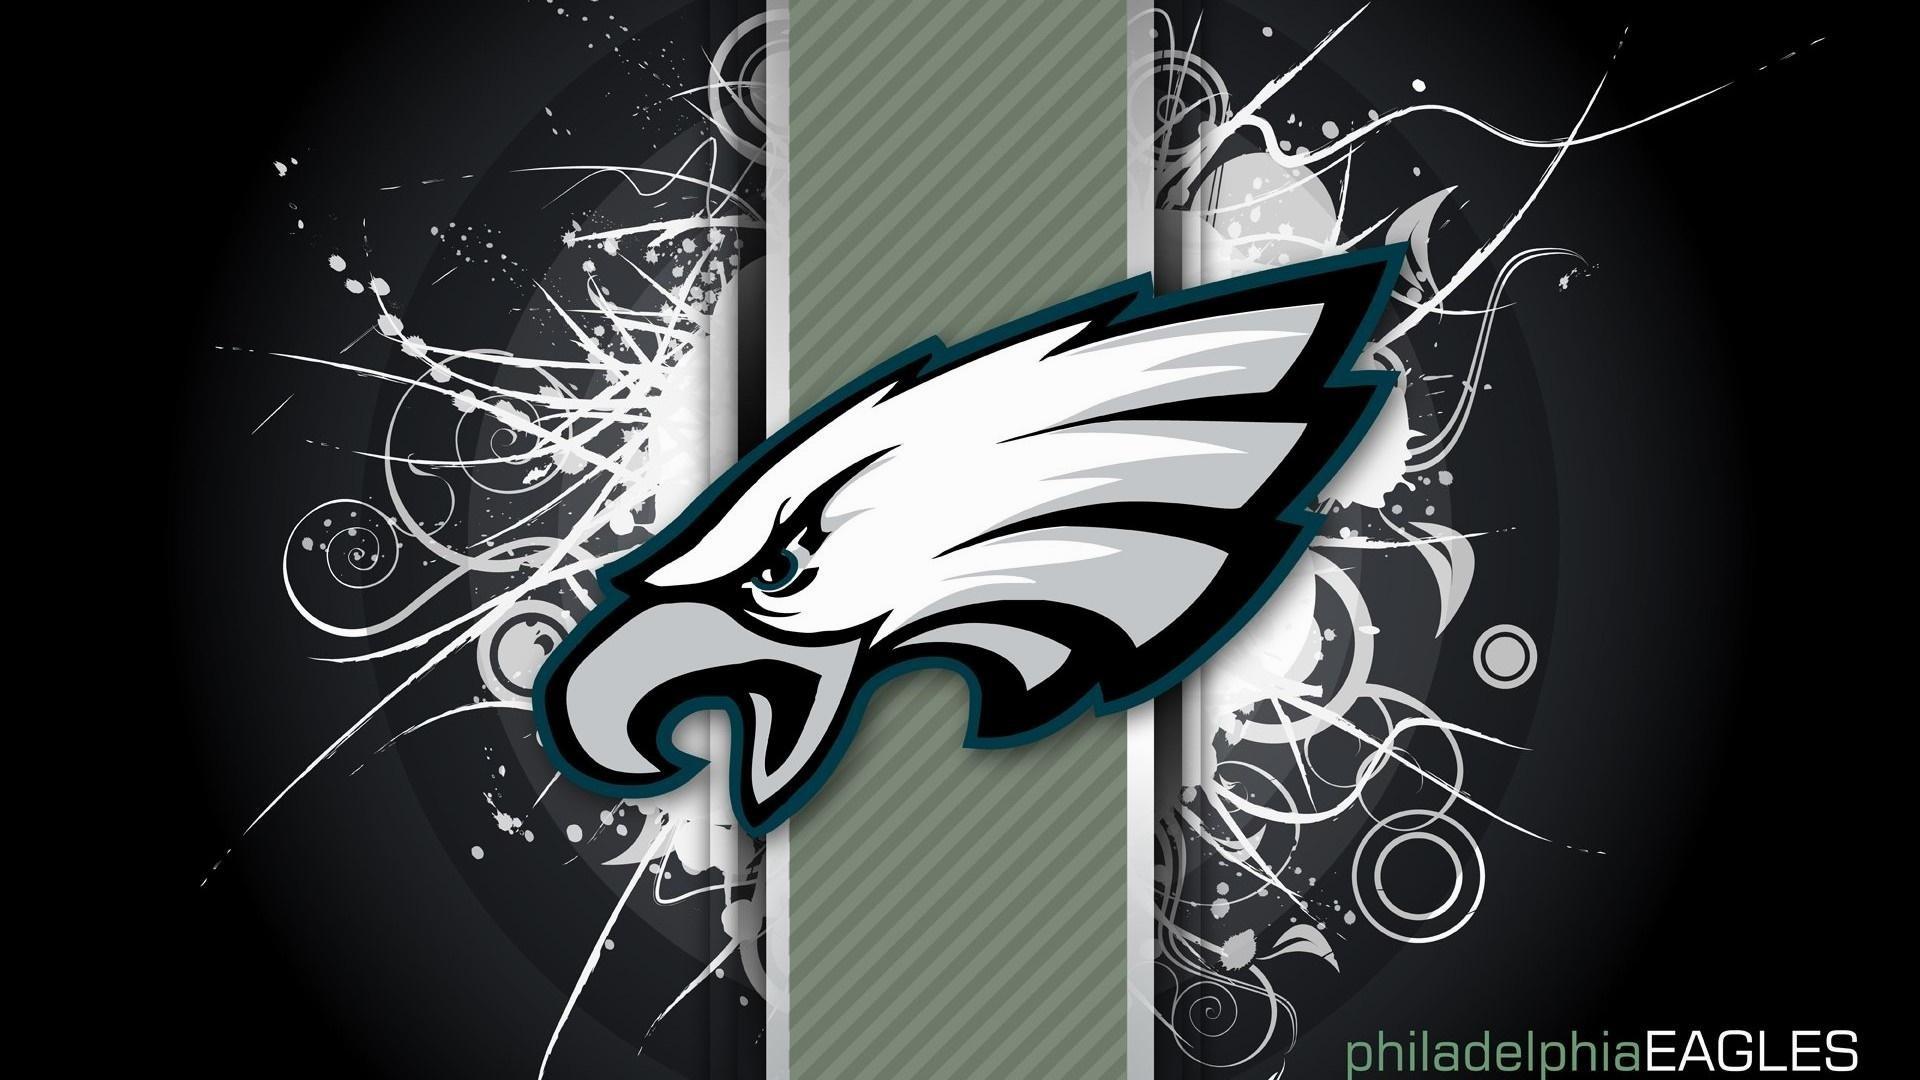 1920x1408 Philadelphia Eagles Wallpaper Awesome Backgrounds